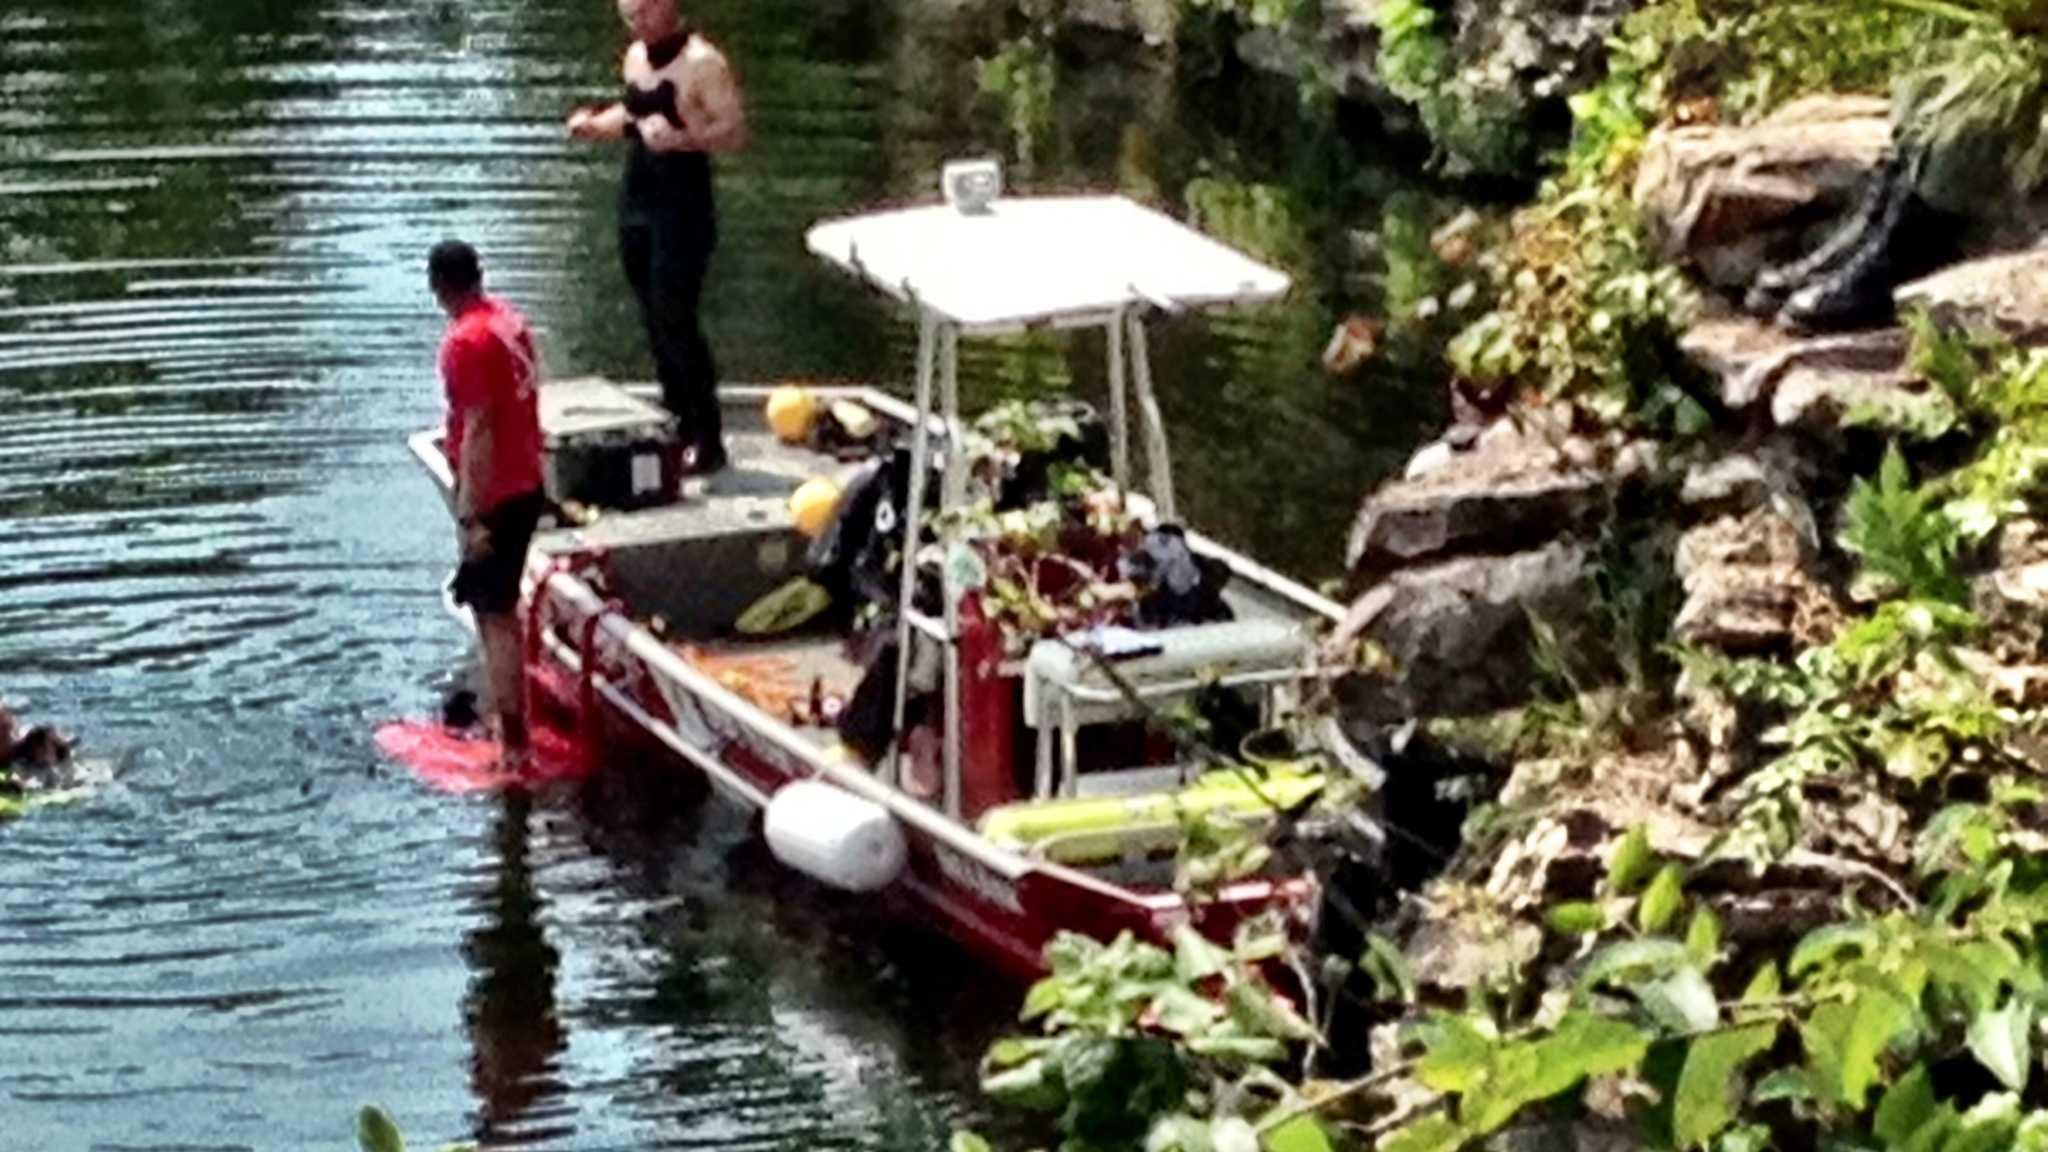 pond creek dive team search 4.jpg